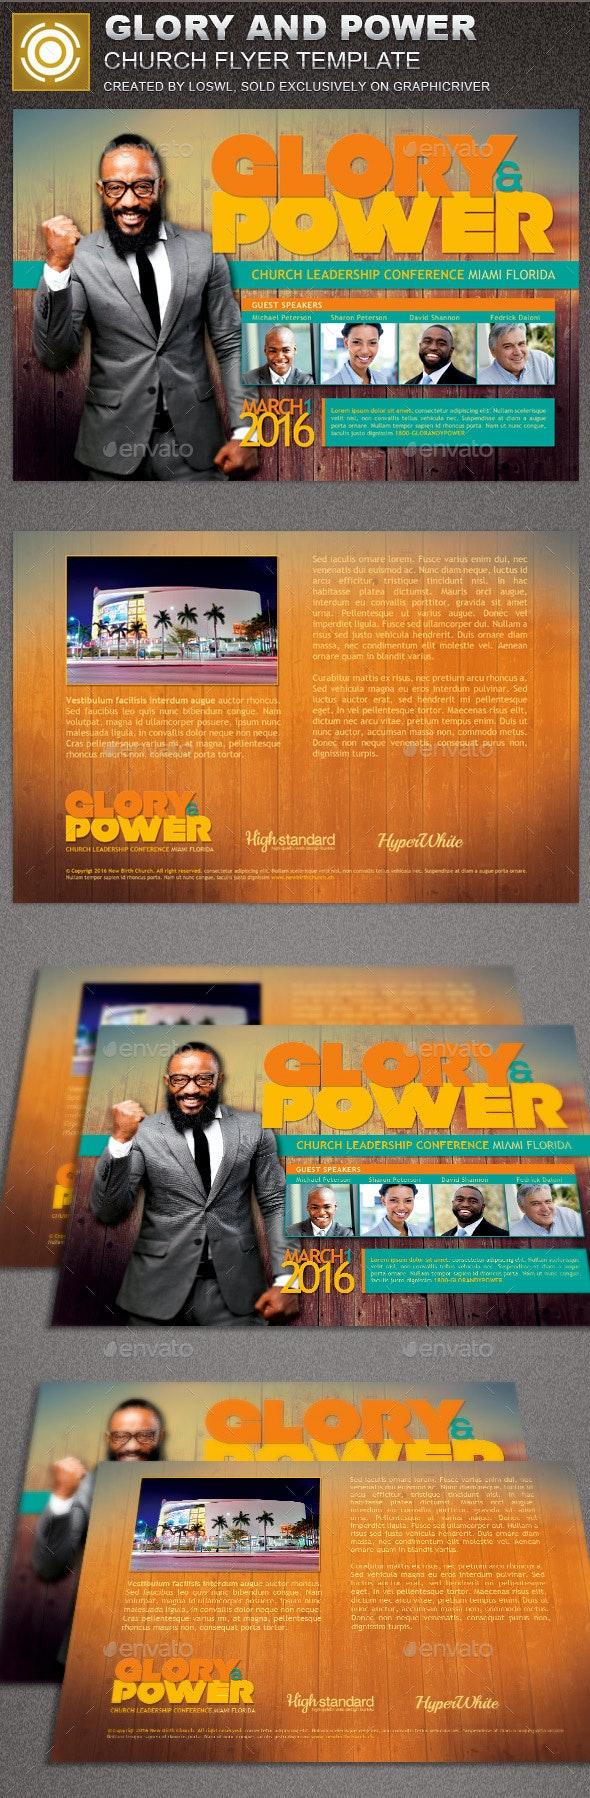 Glory and Power Church Flyer Template - Church Flyers